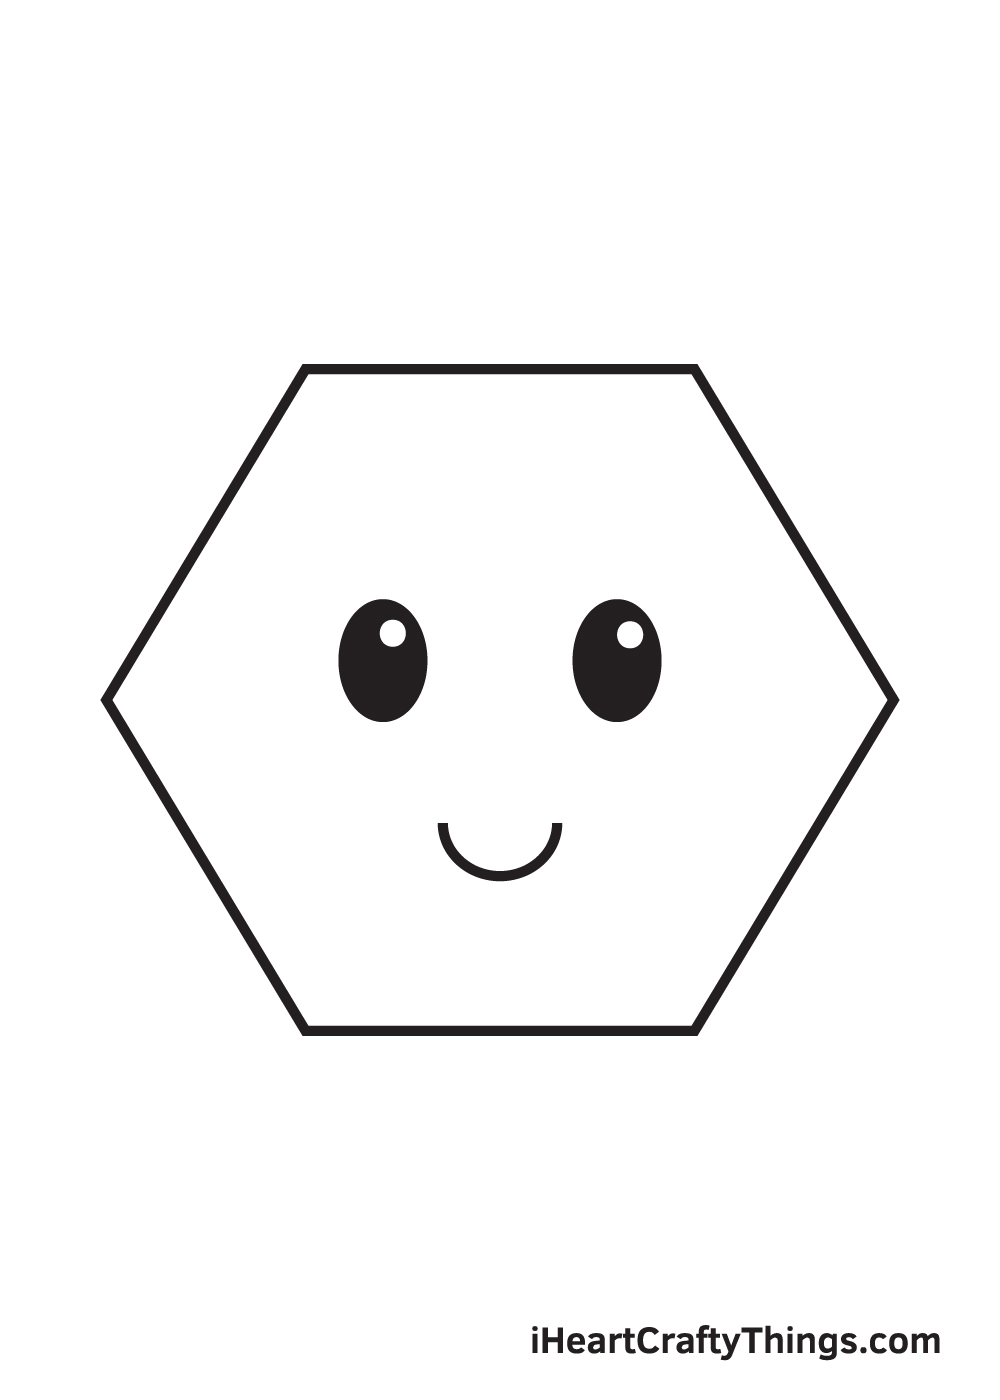 hexagon drawing step 8